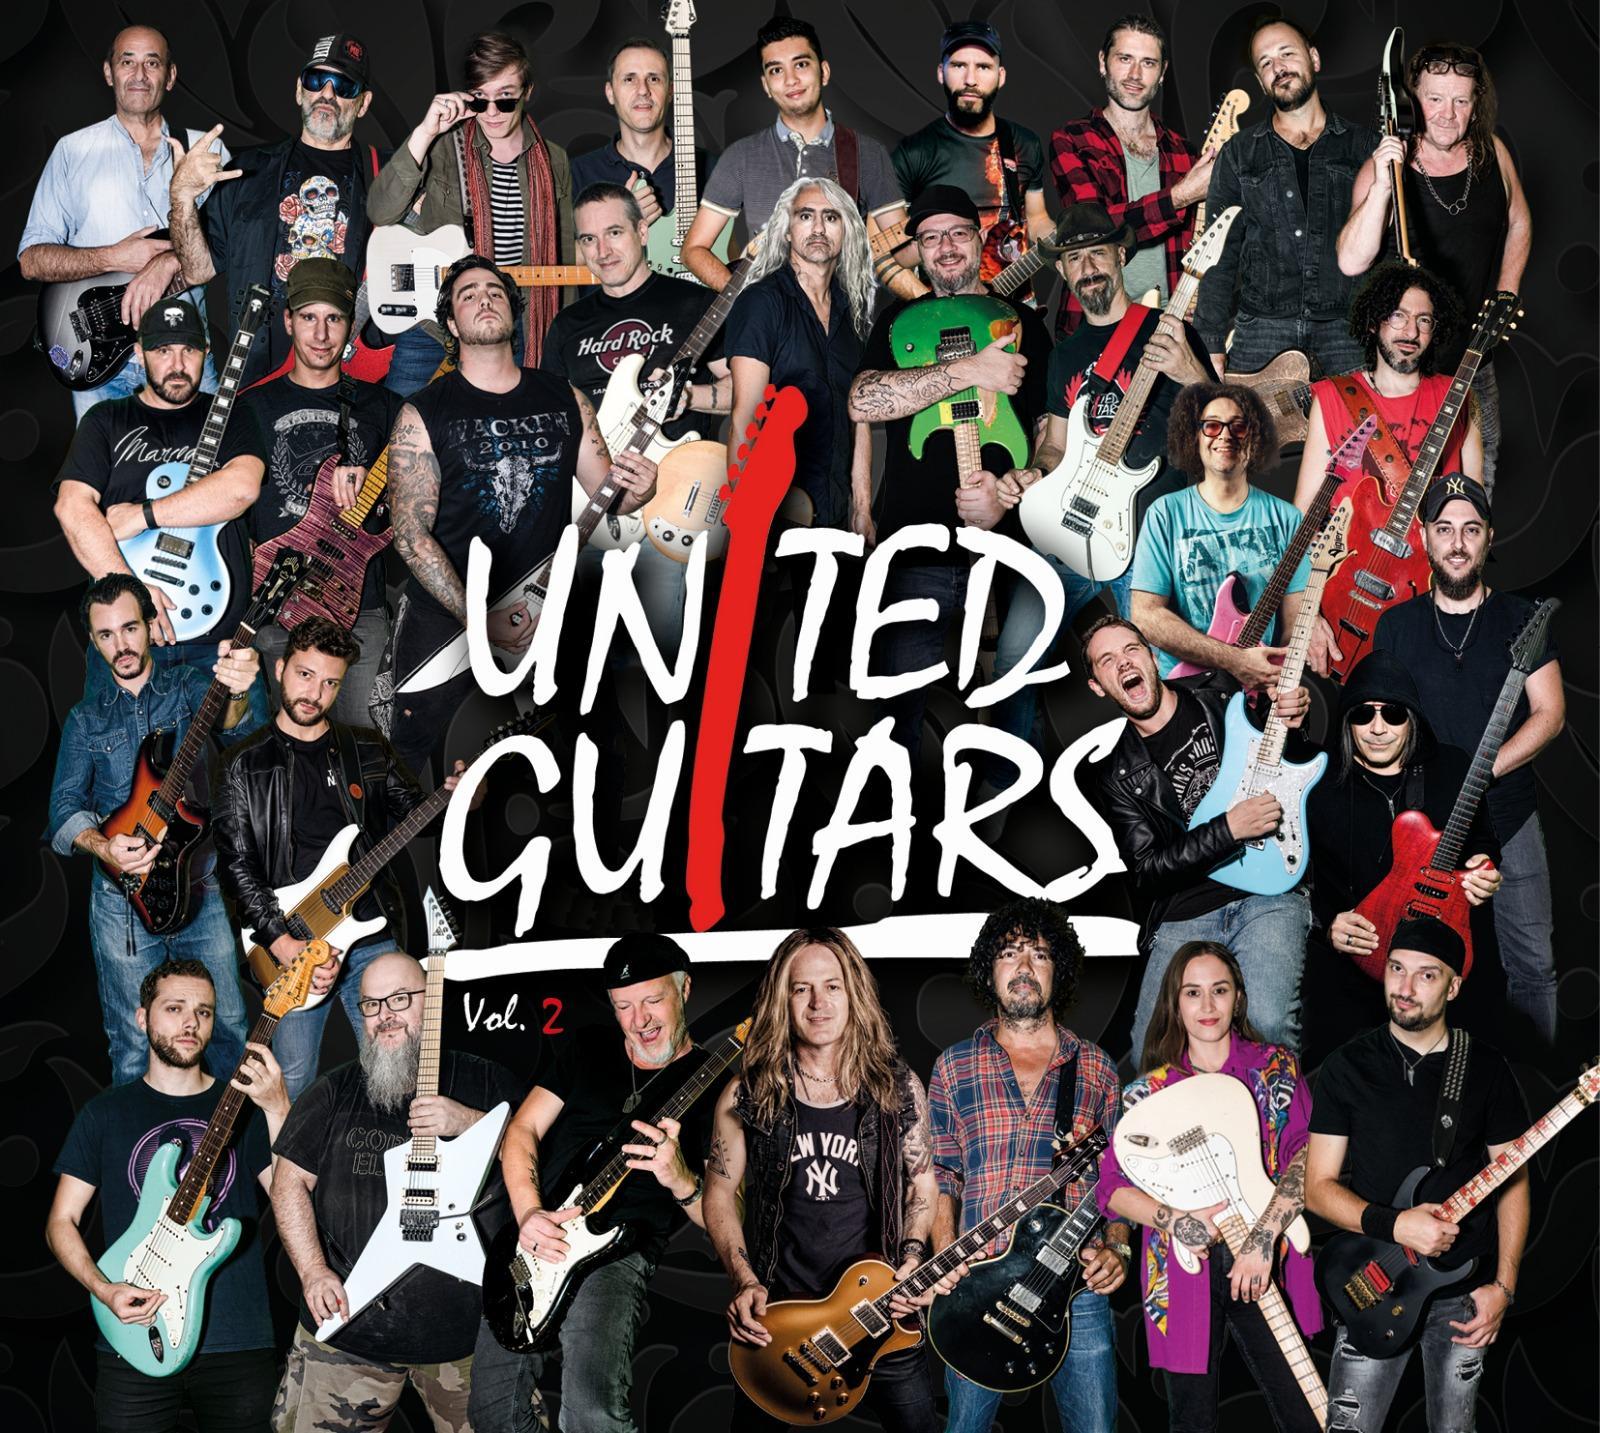 United guitars vol 2